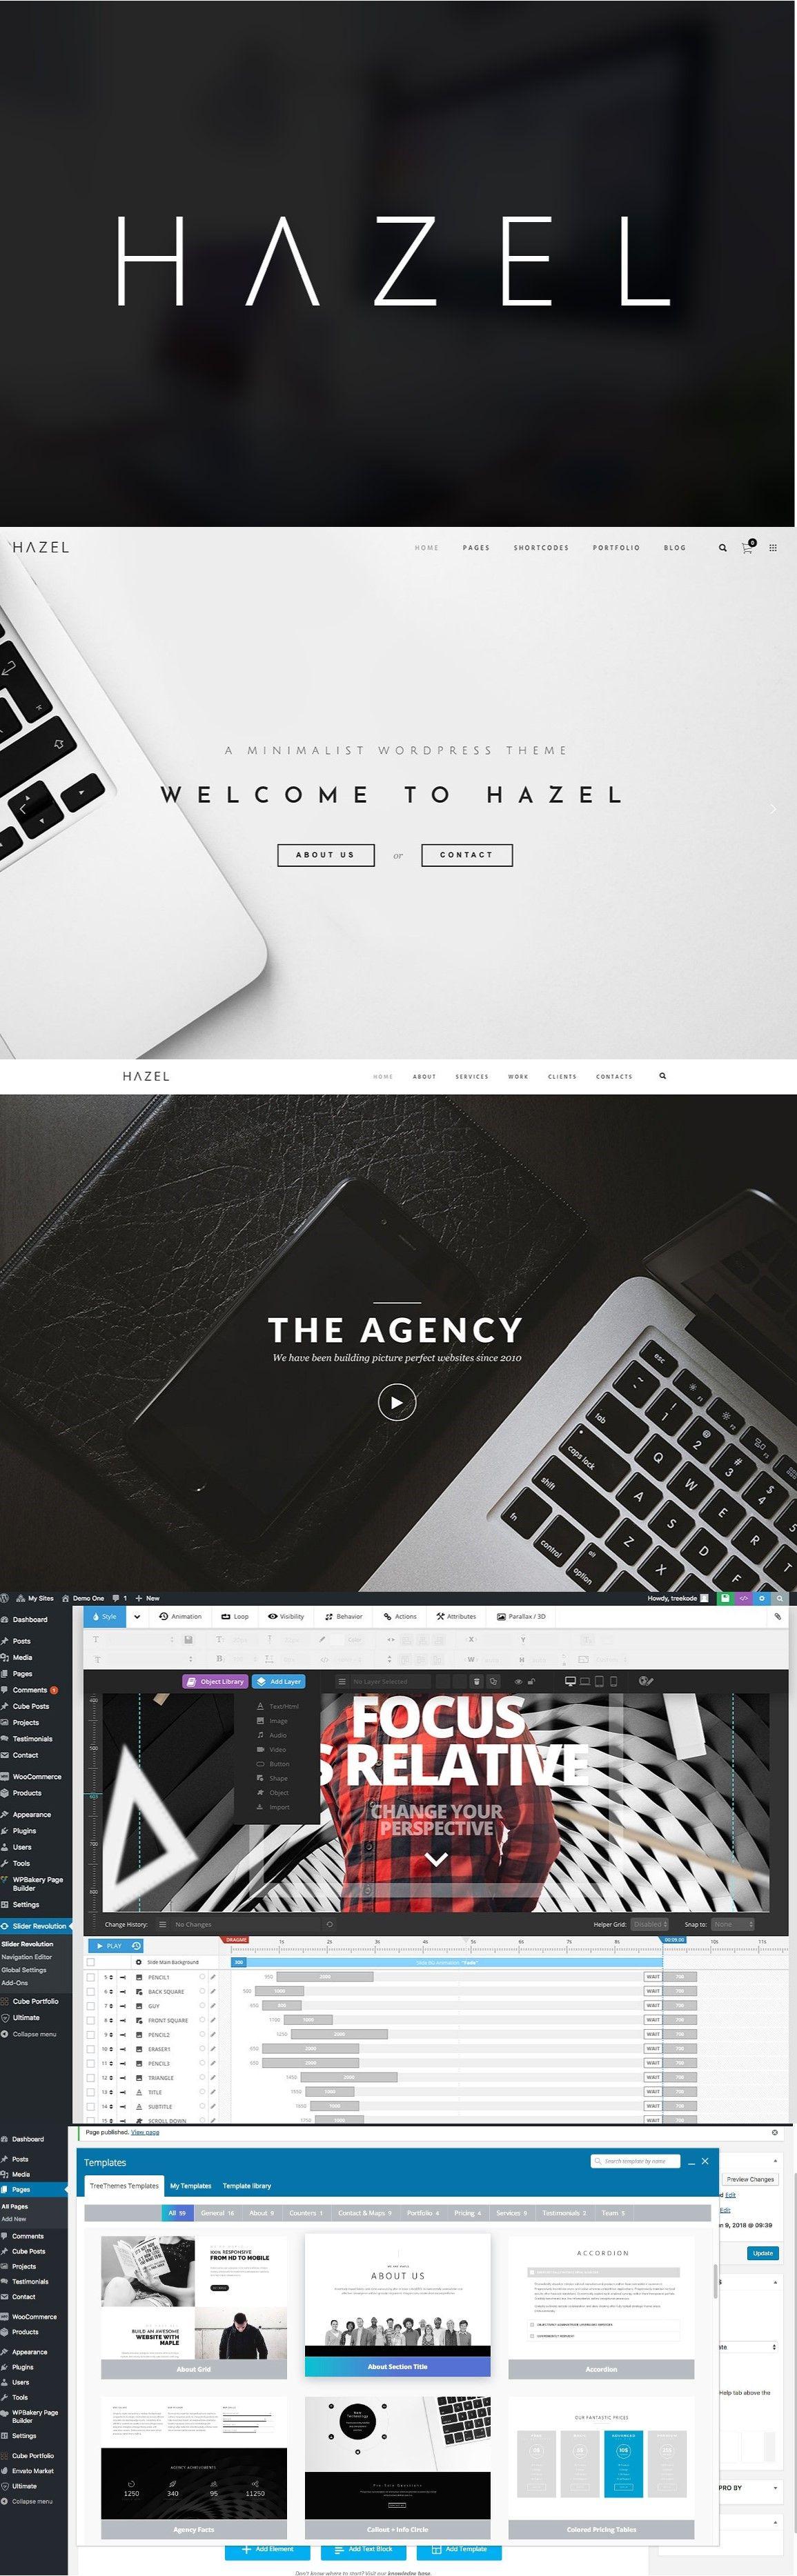 Hazel MultiPurpose WordPress Theme Blog navigation